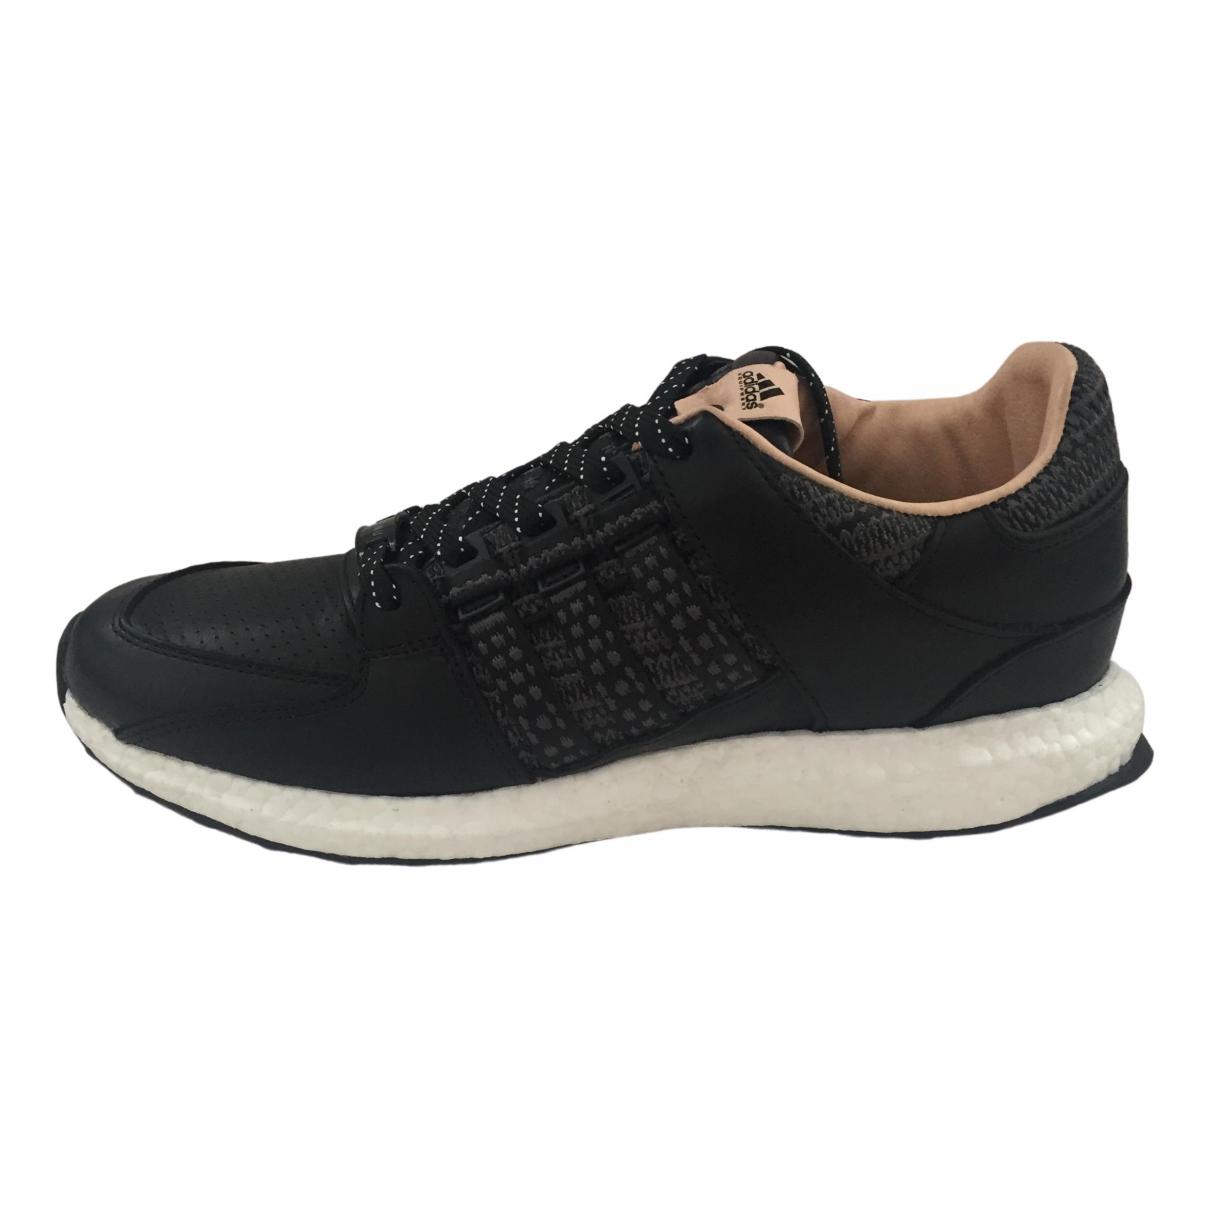 Adidas EQT Support Sneakers in  Schwarz Leder